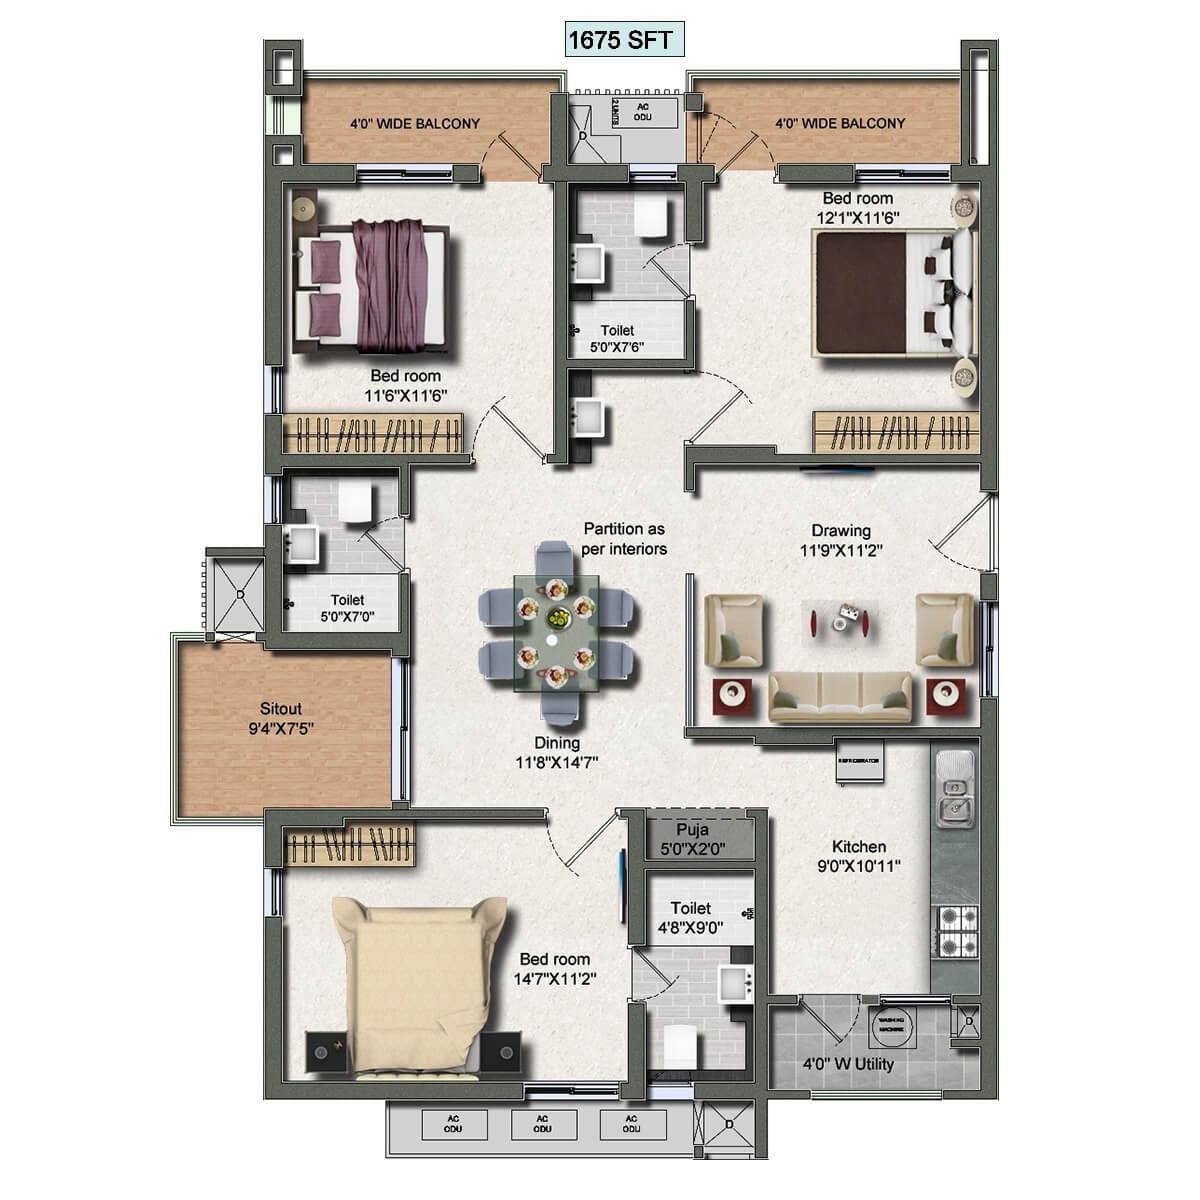 vertex panache apartment 3bhk 1675sqft 1